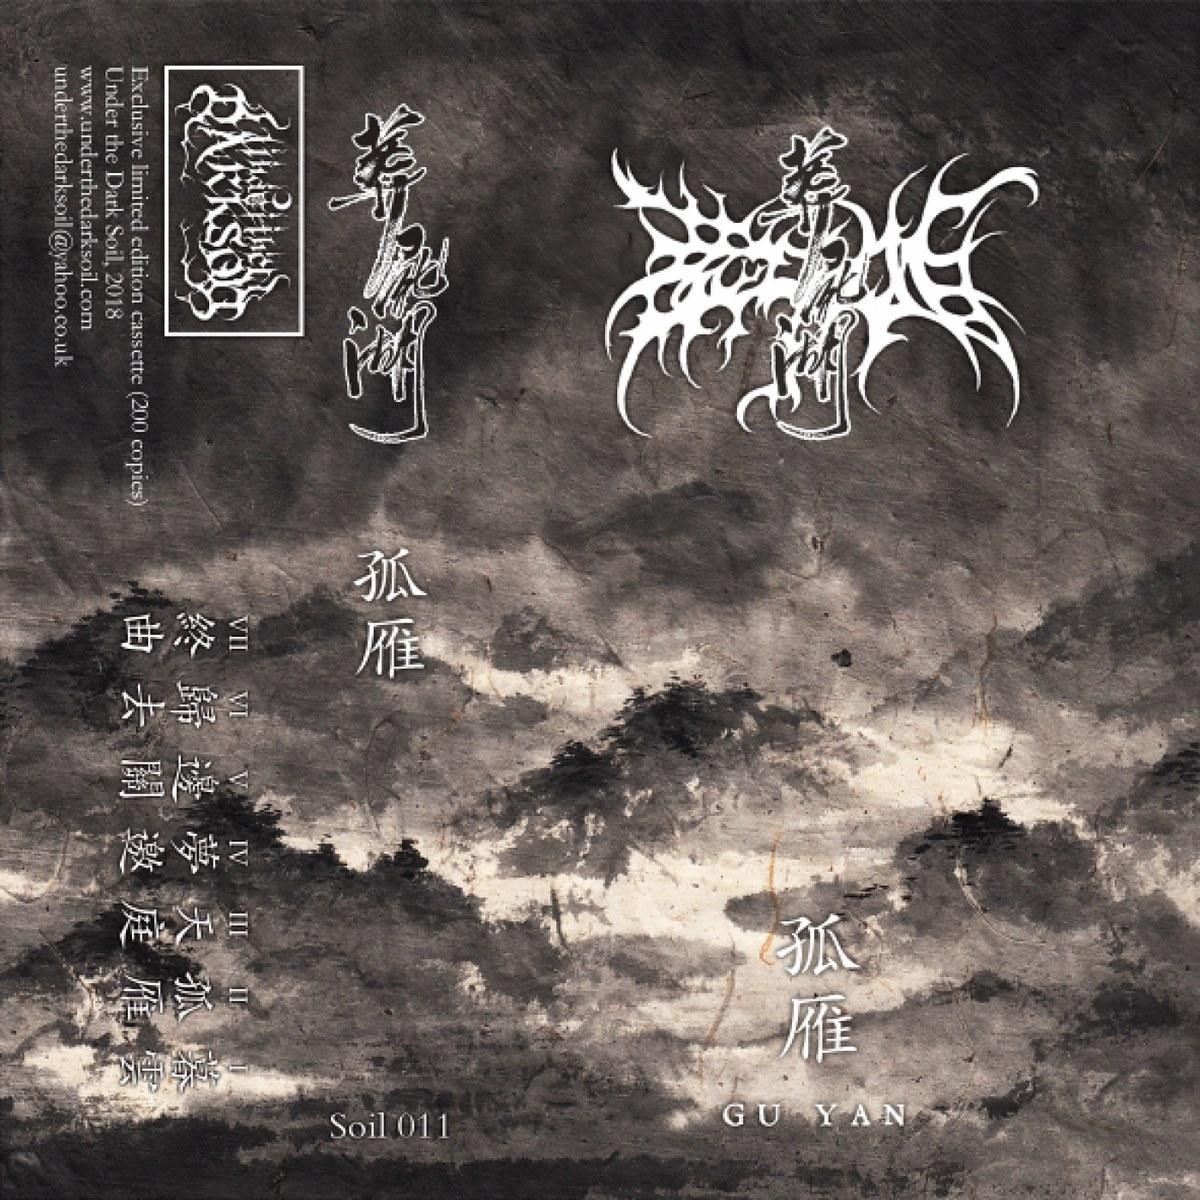 Review for Zuriaake / 葬尸湖 - 孤雁 (Gu Yan)